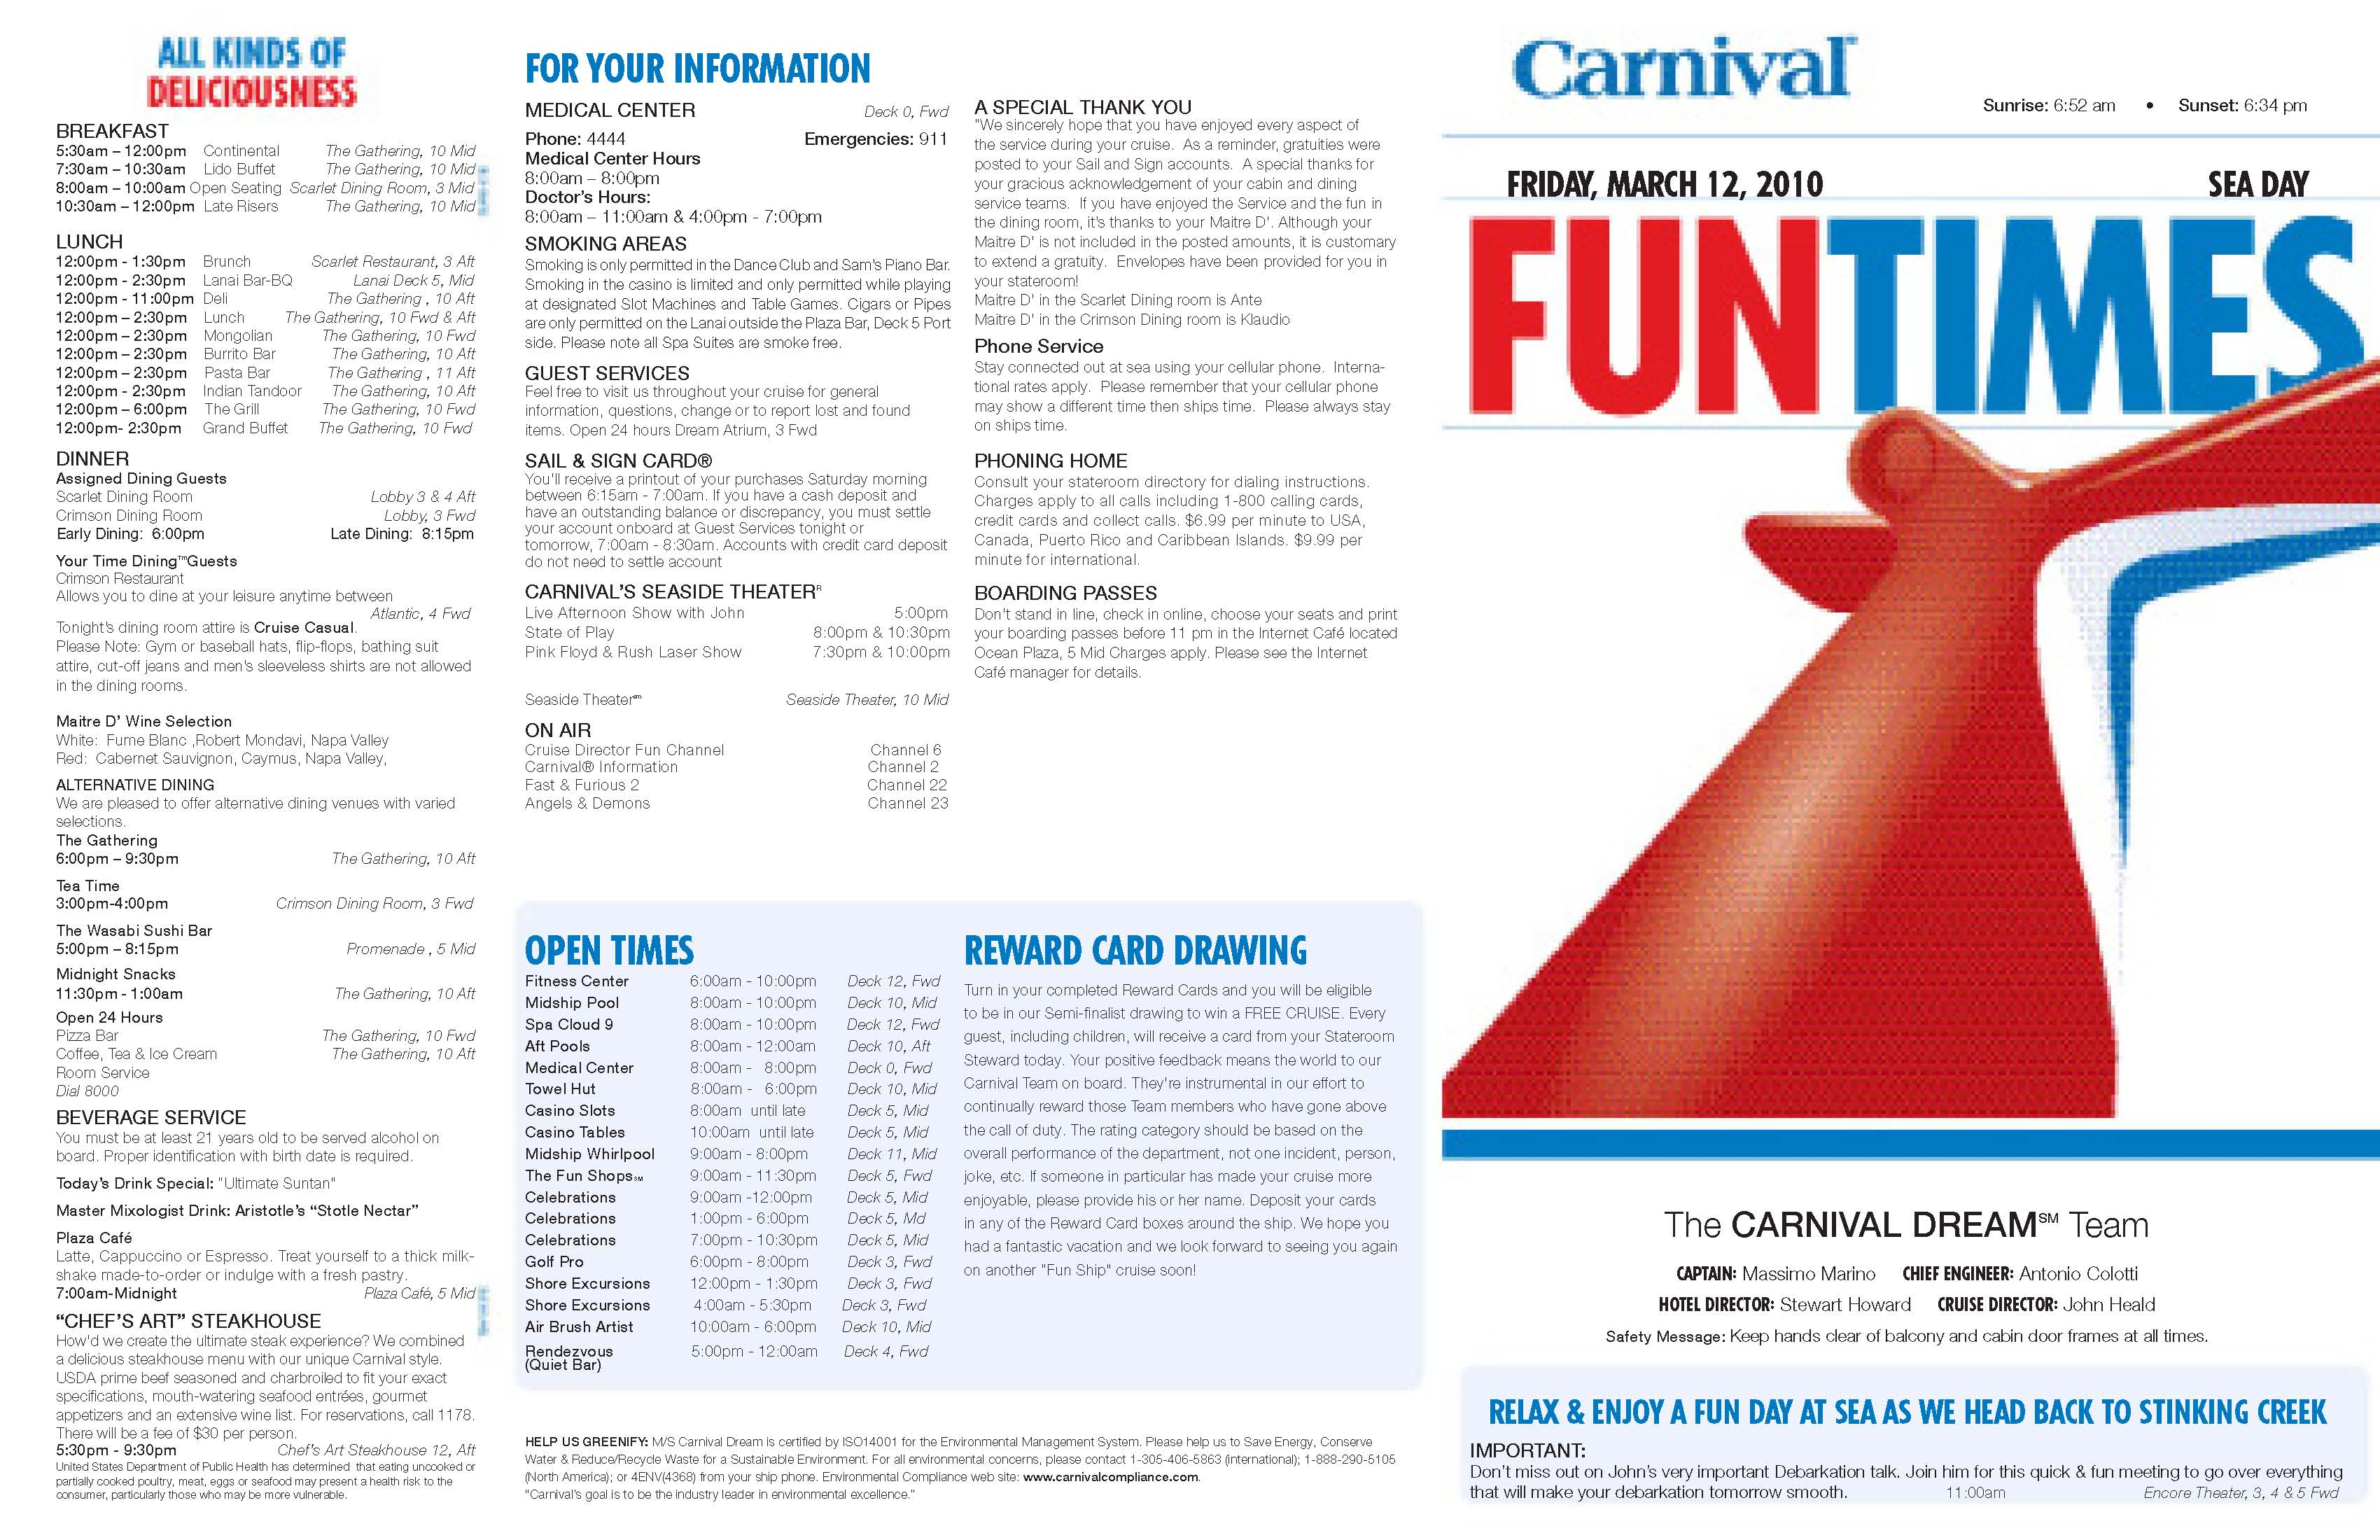 Dream Fun Times - Cruise Critic Message Board Forums